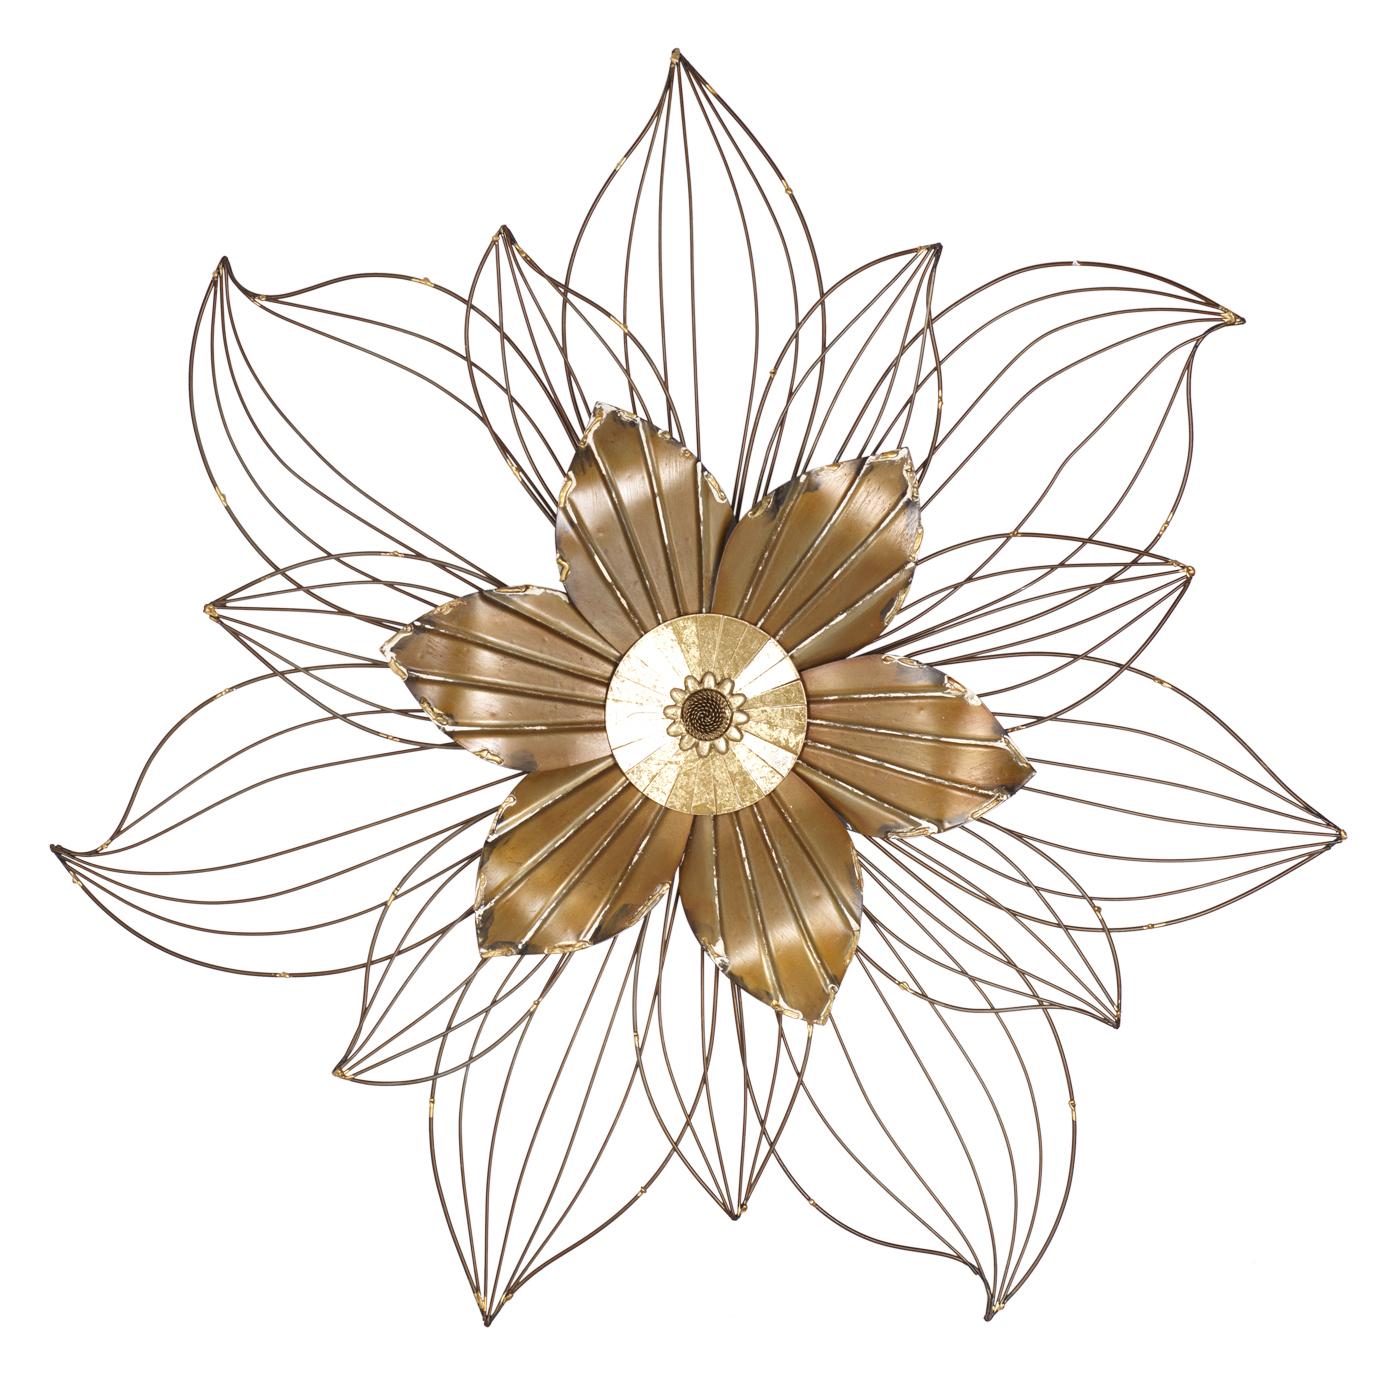 {} Home Philosophy Настенный декор Harmony (5х67 см) декор настенный gardman butterfly 12 5 х 16 5 см